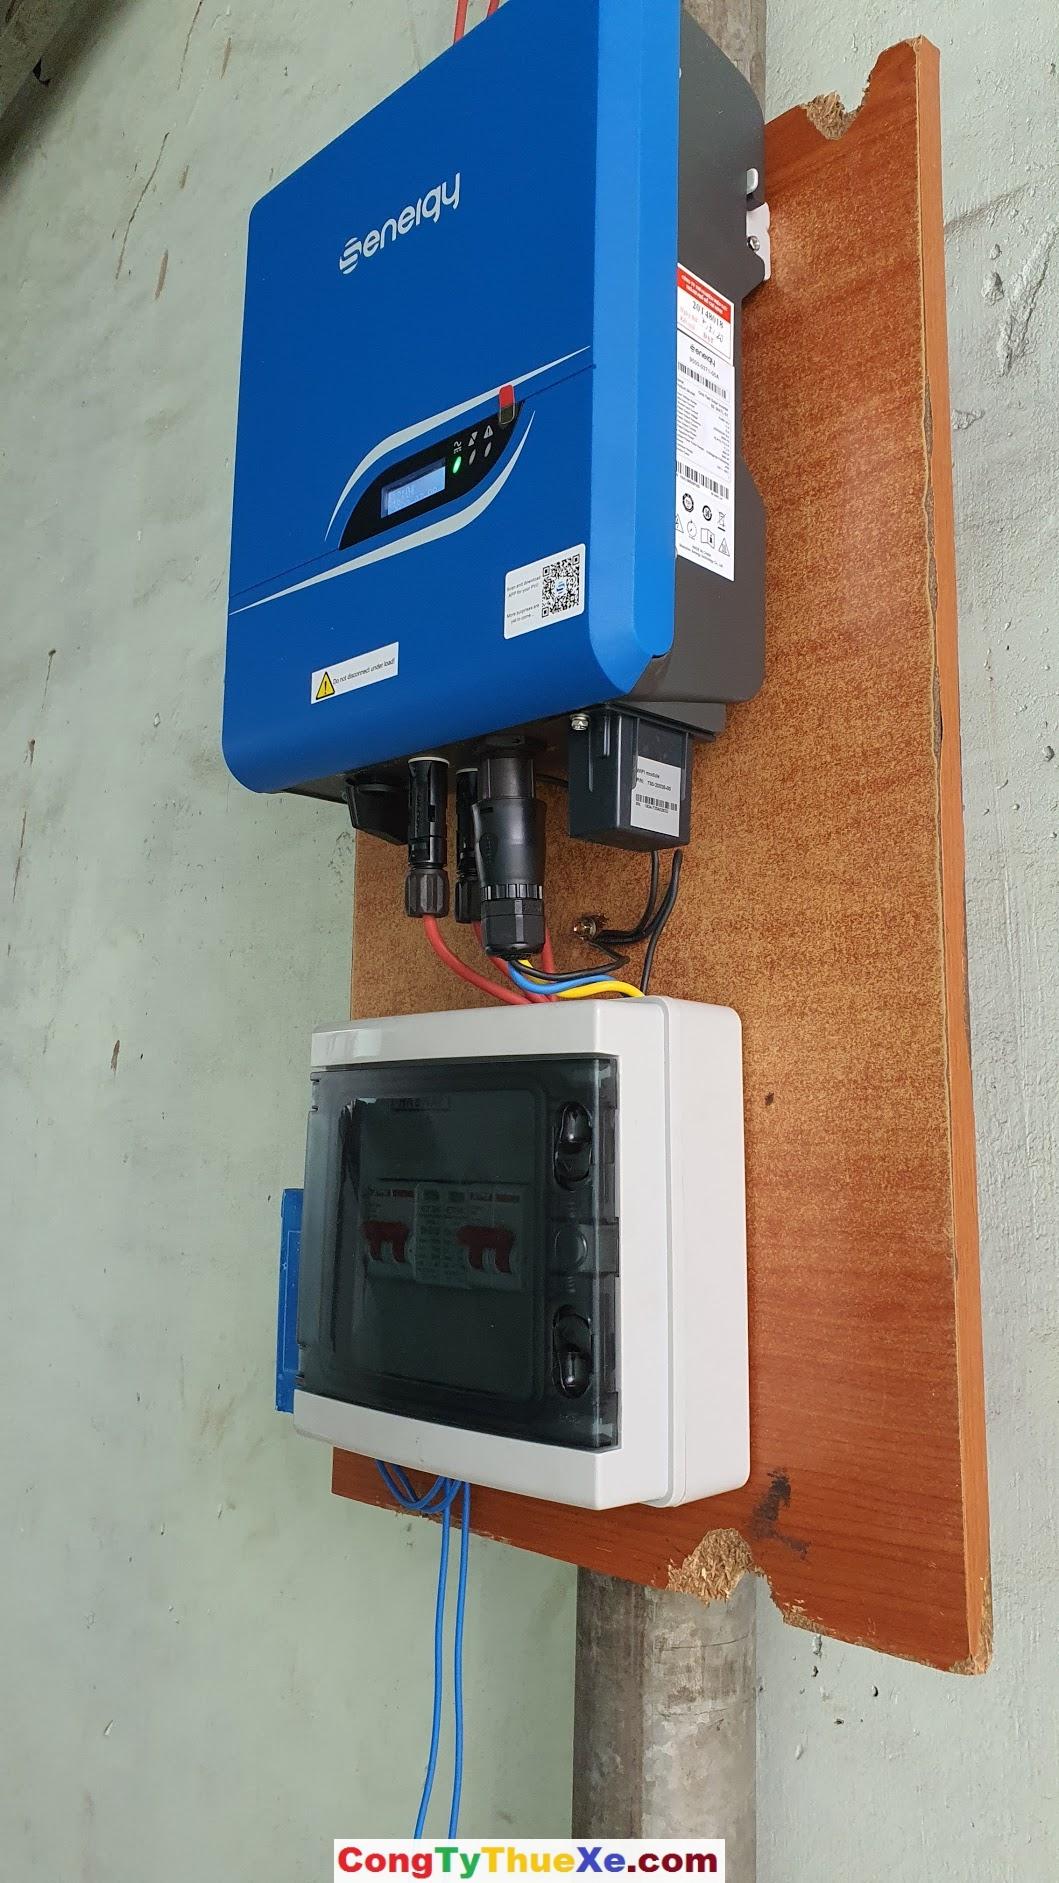 Senergy inverter 3600w